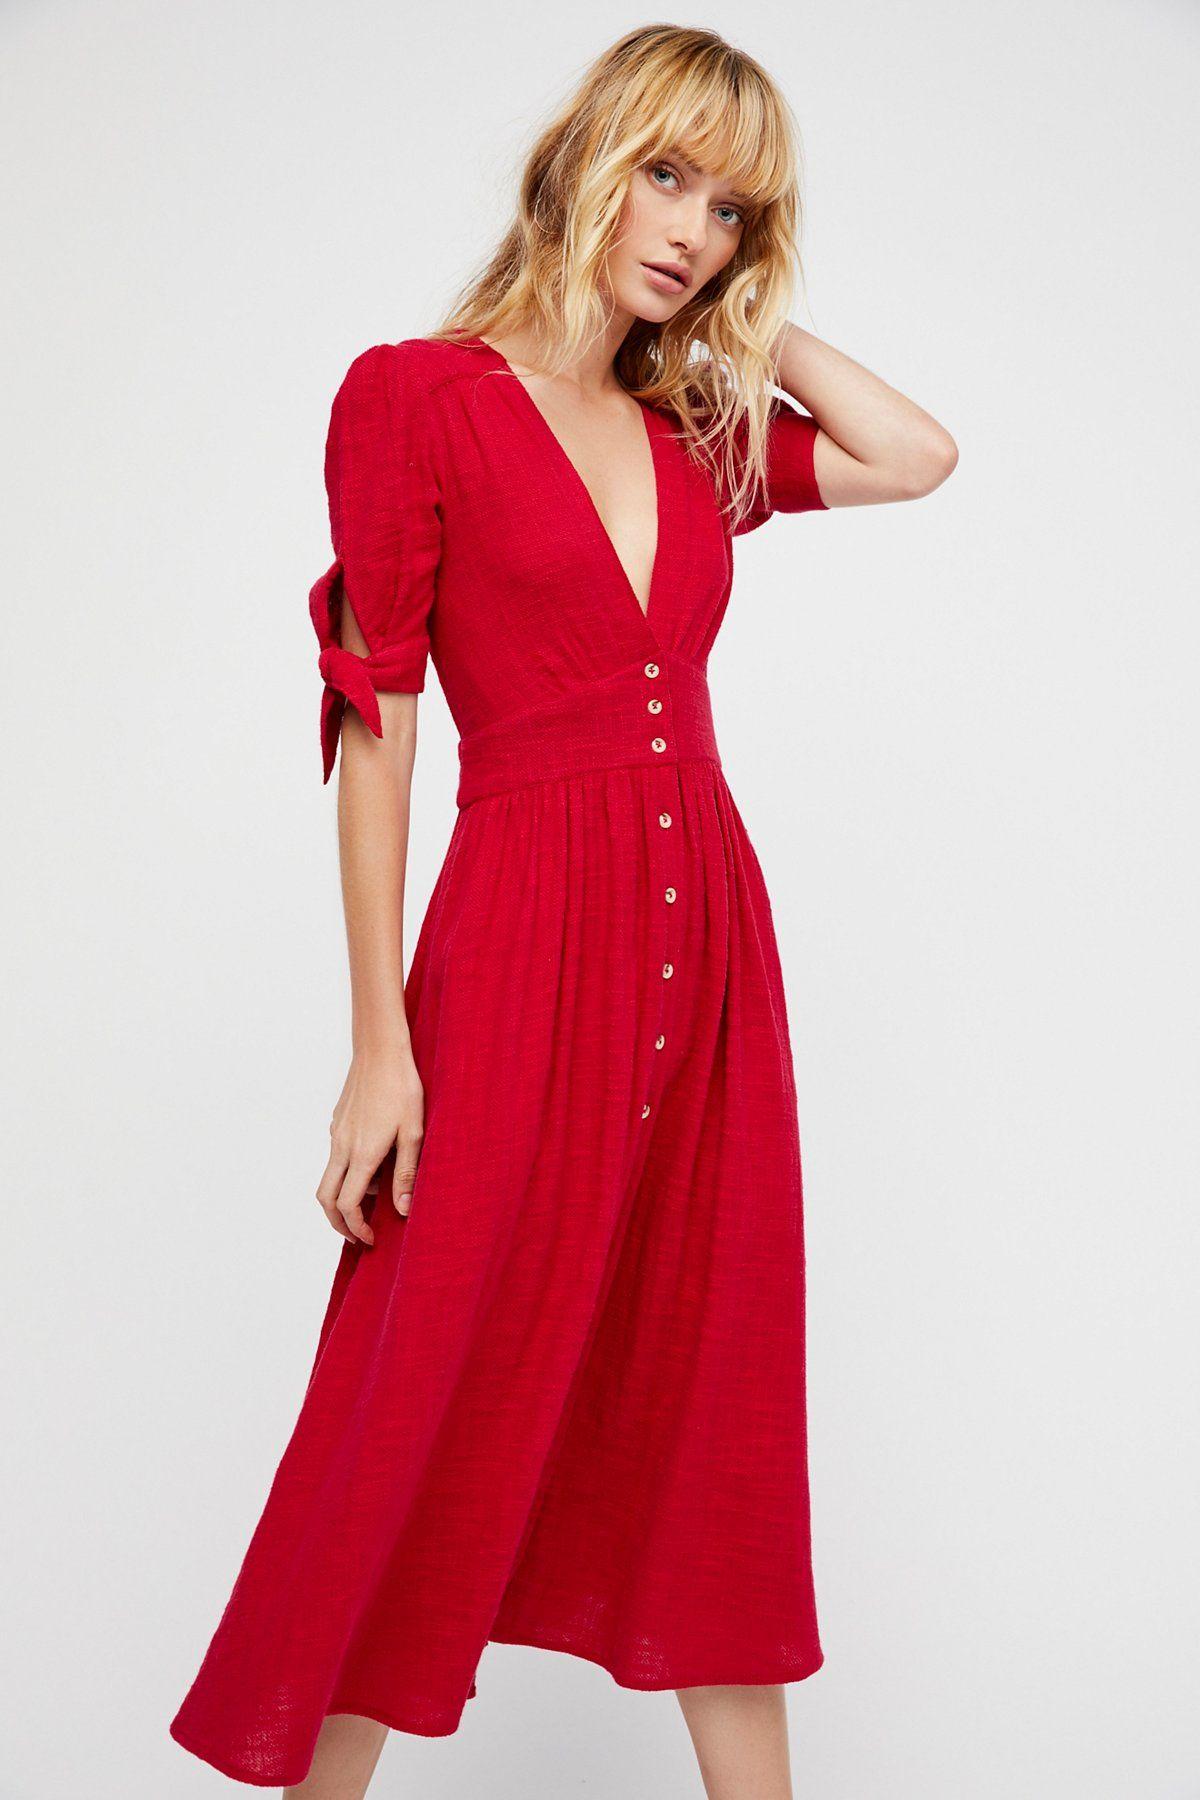 Love Of My Life Midi Dress Trendy Dresses Summer Midi Dress Summer Summer Dresses [ 1800 x 1200 Pixel ]